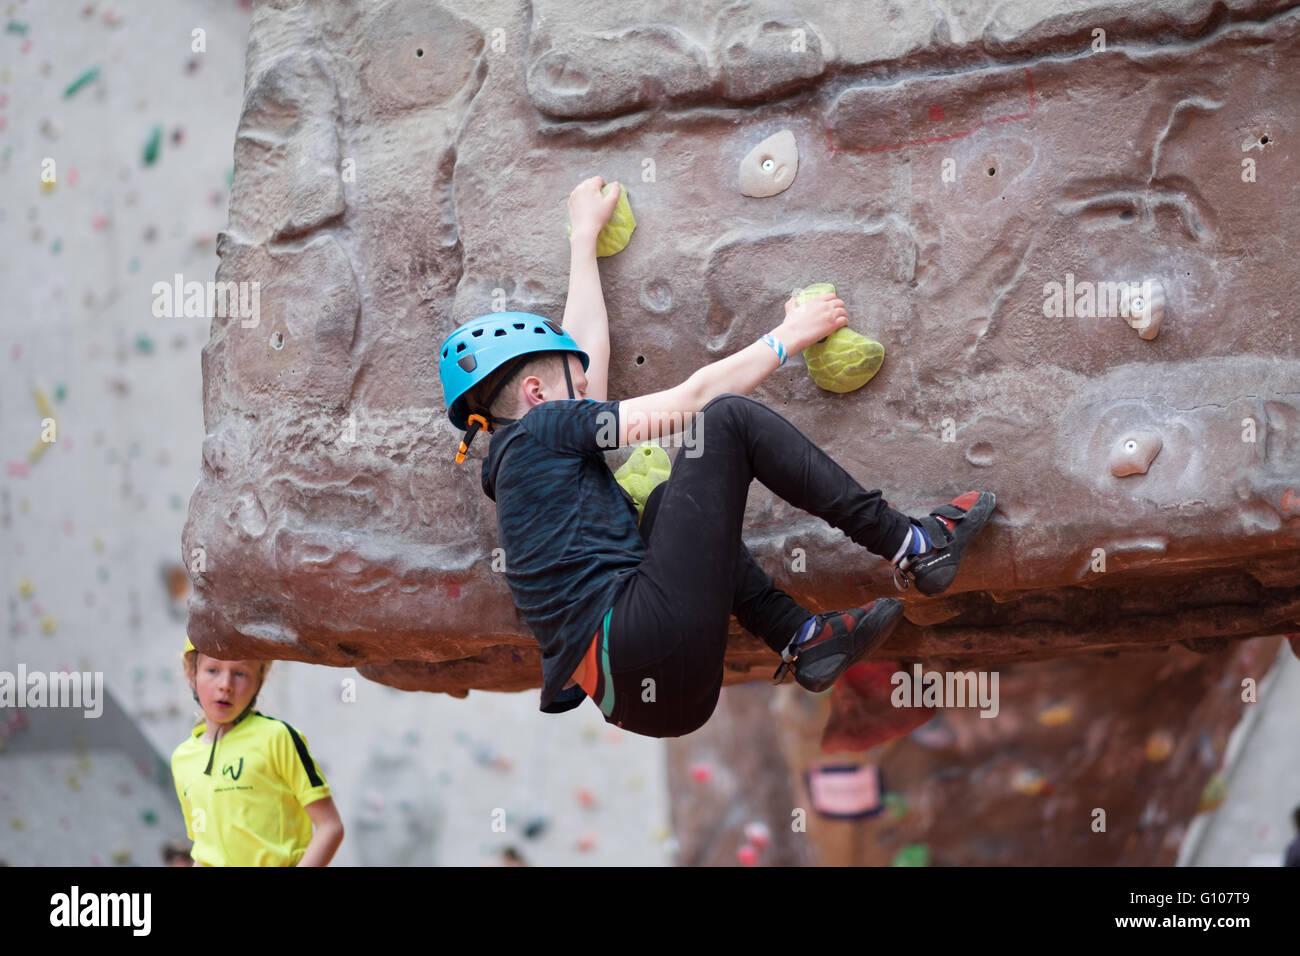 Climber bouldering at an indoor rock climbing centre in Ratho Edinburgh - Stock Image